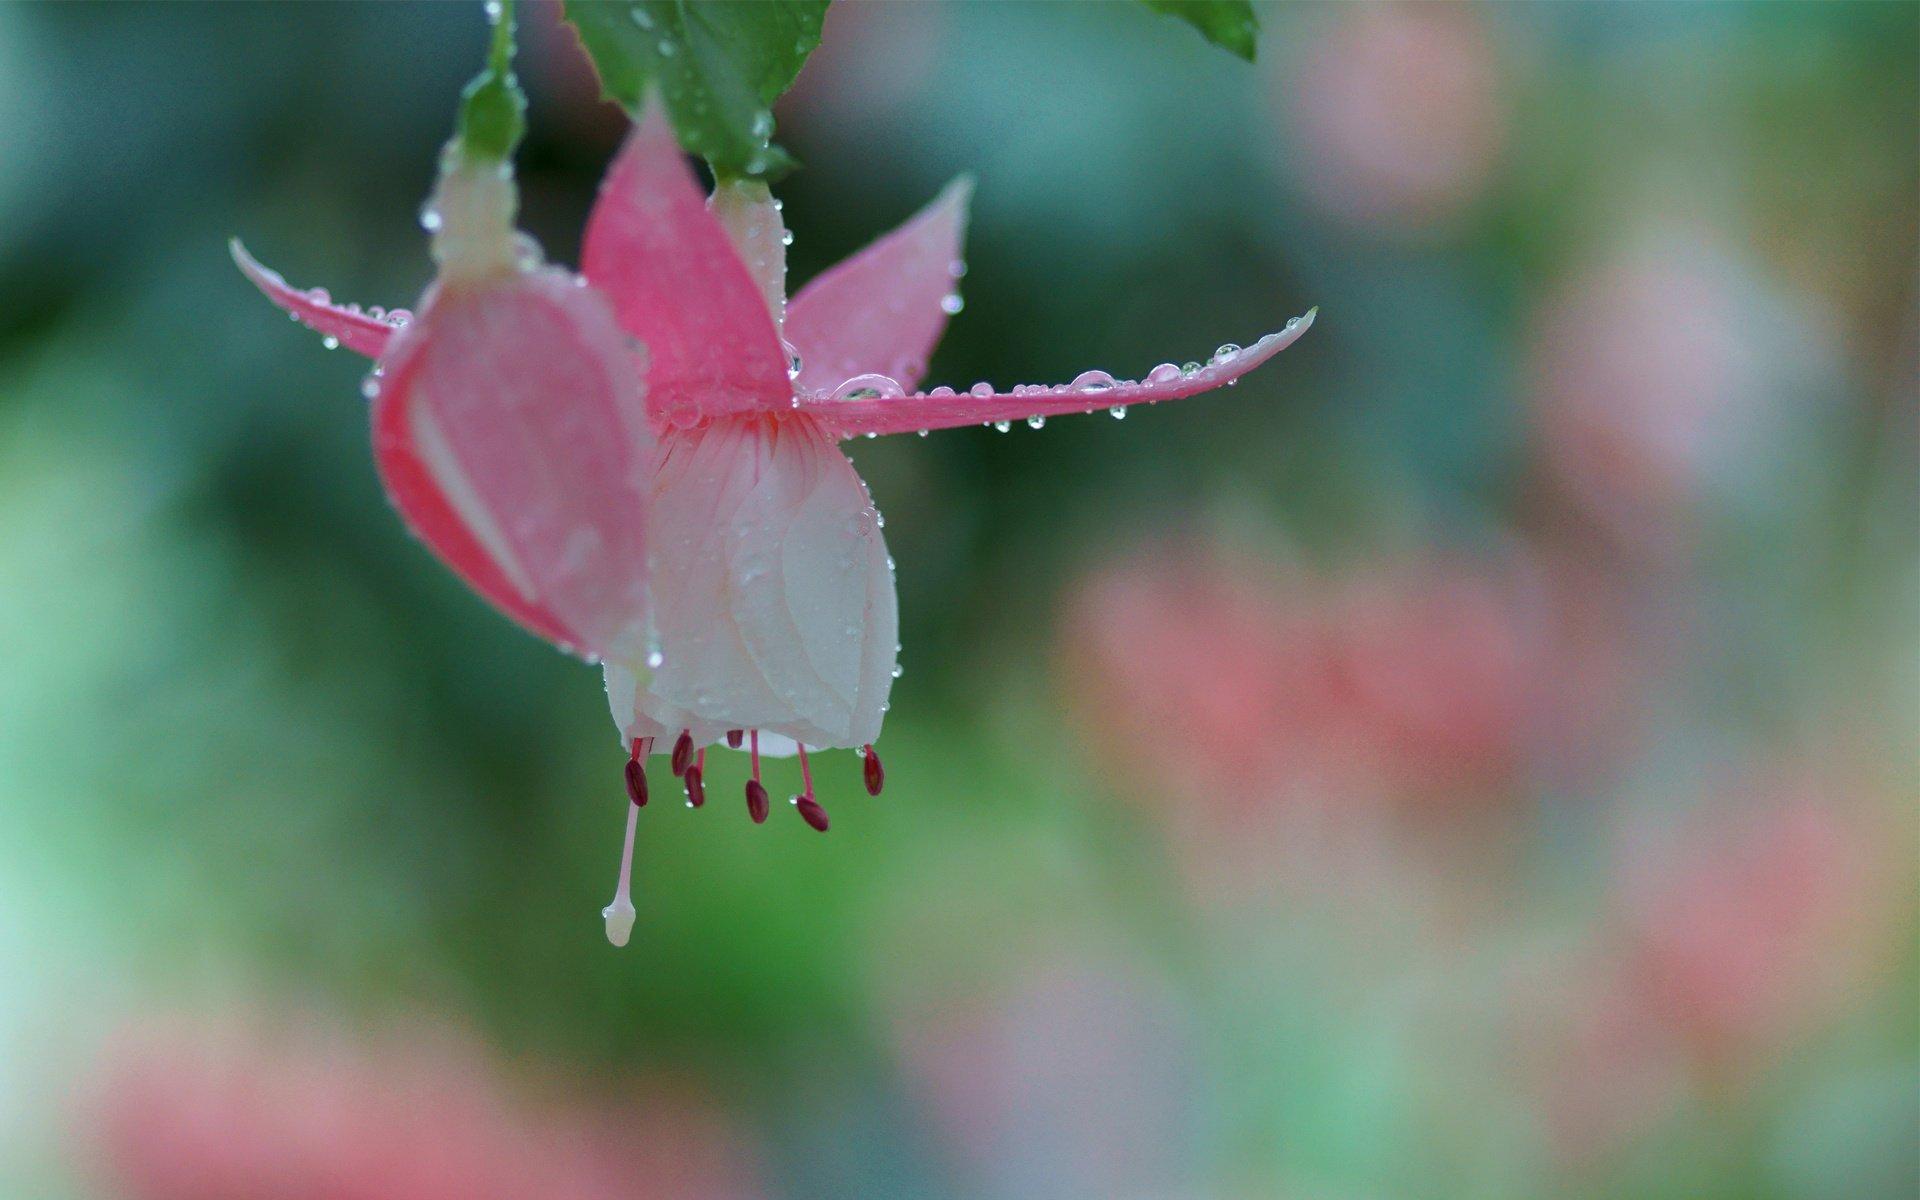 картинки капли росы